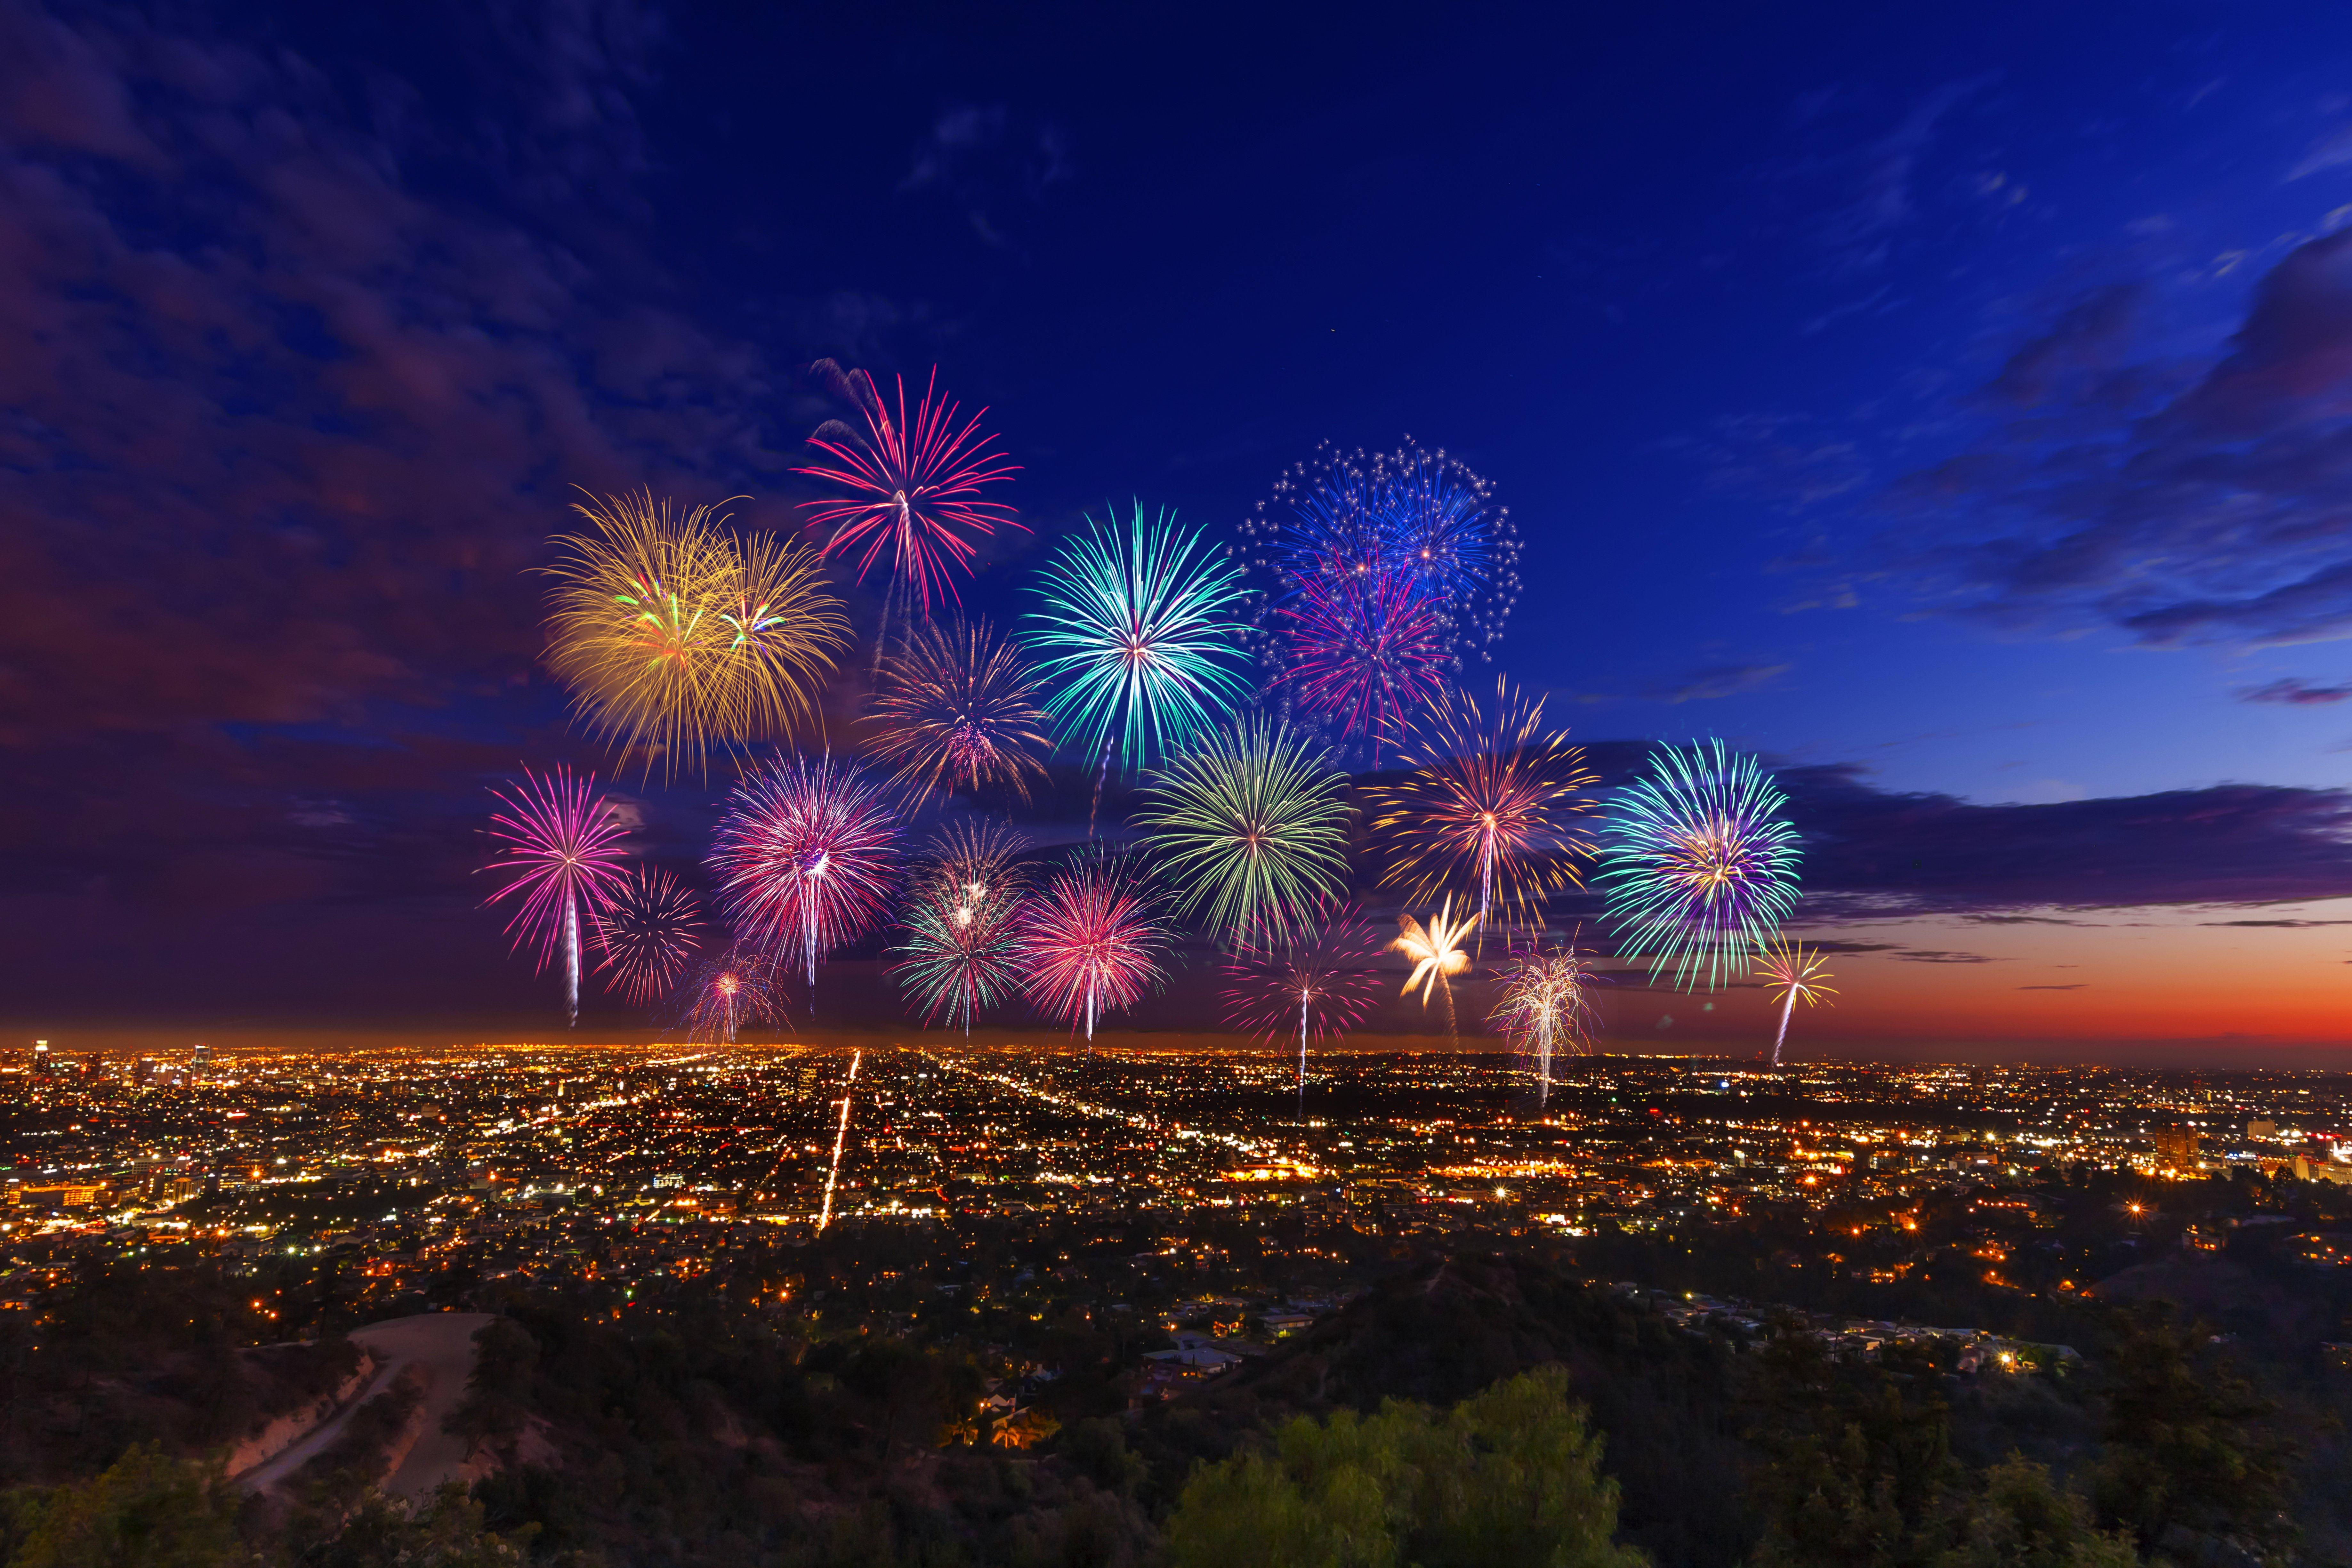 Usa Los Angeles City Night 7348x4899